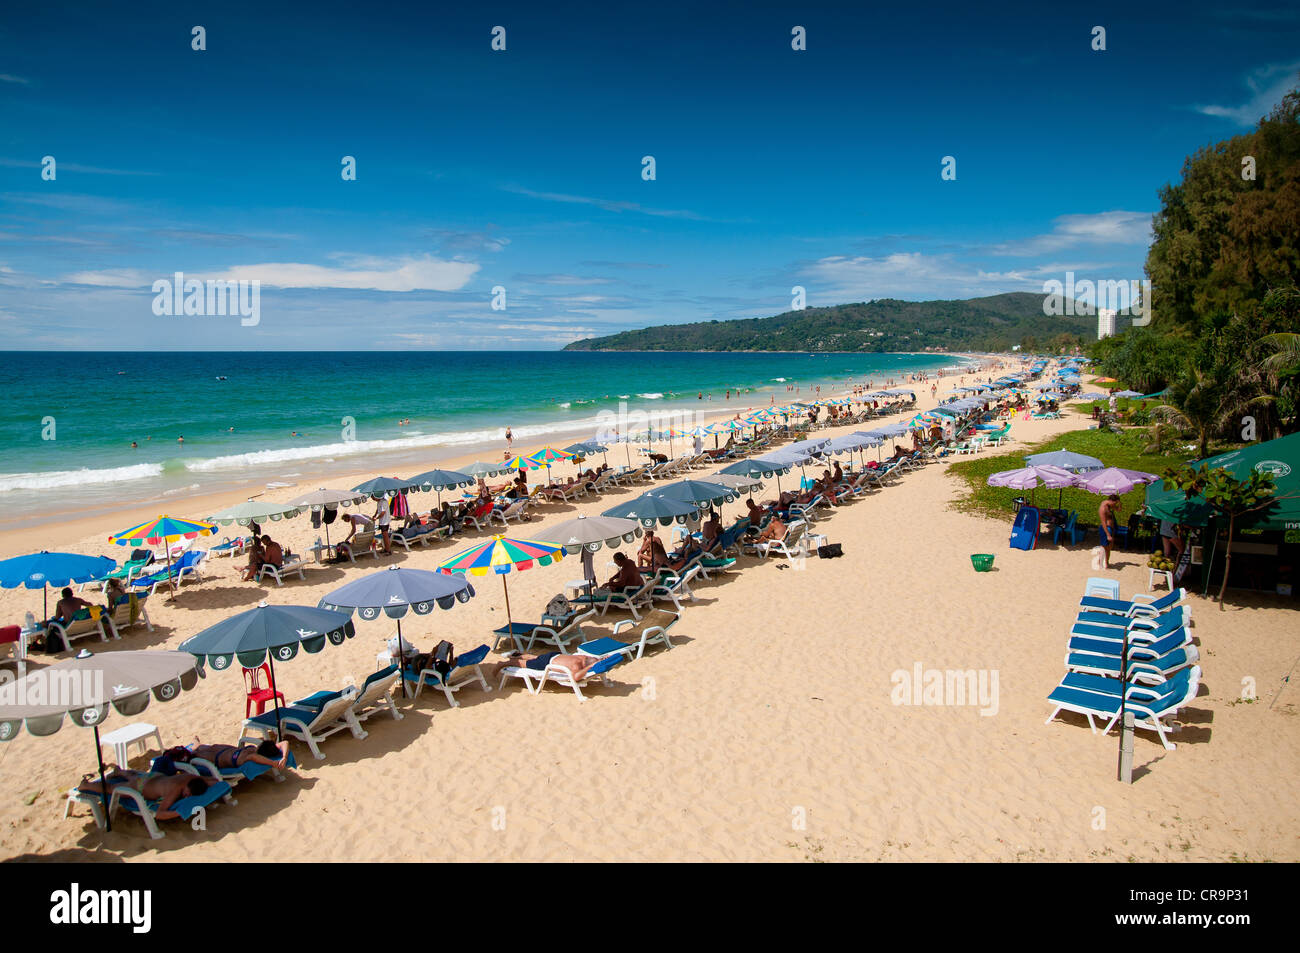 Karon Beach Panorama, Phuket, Thailand - Stock Image